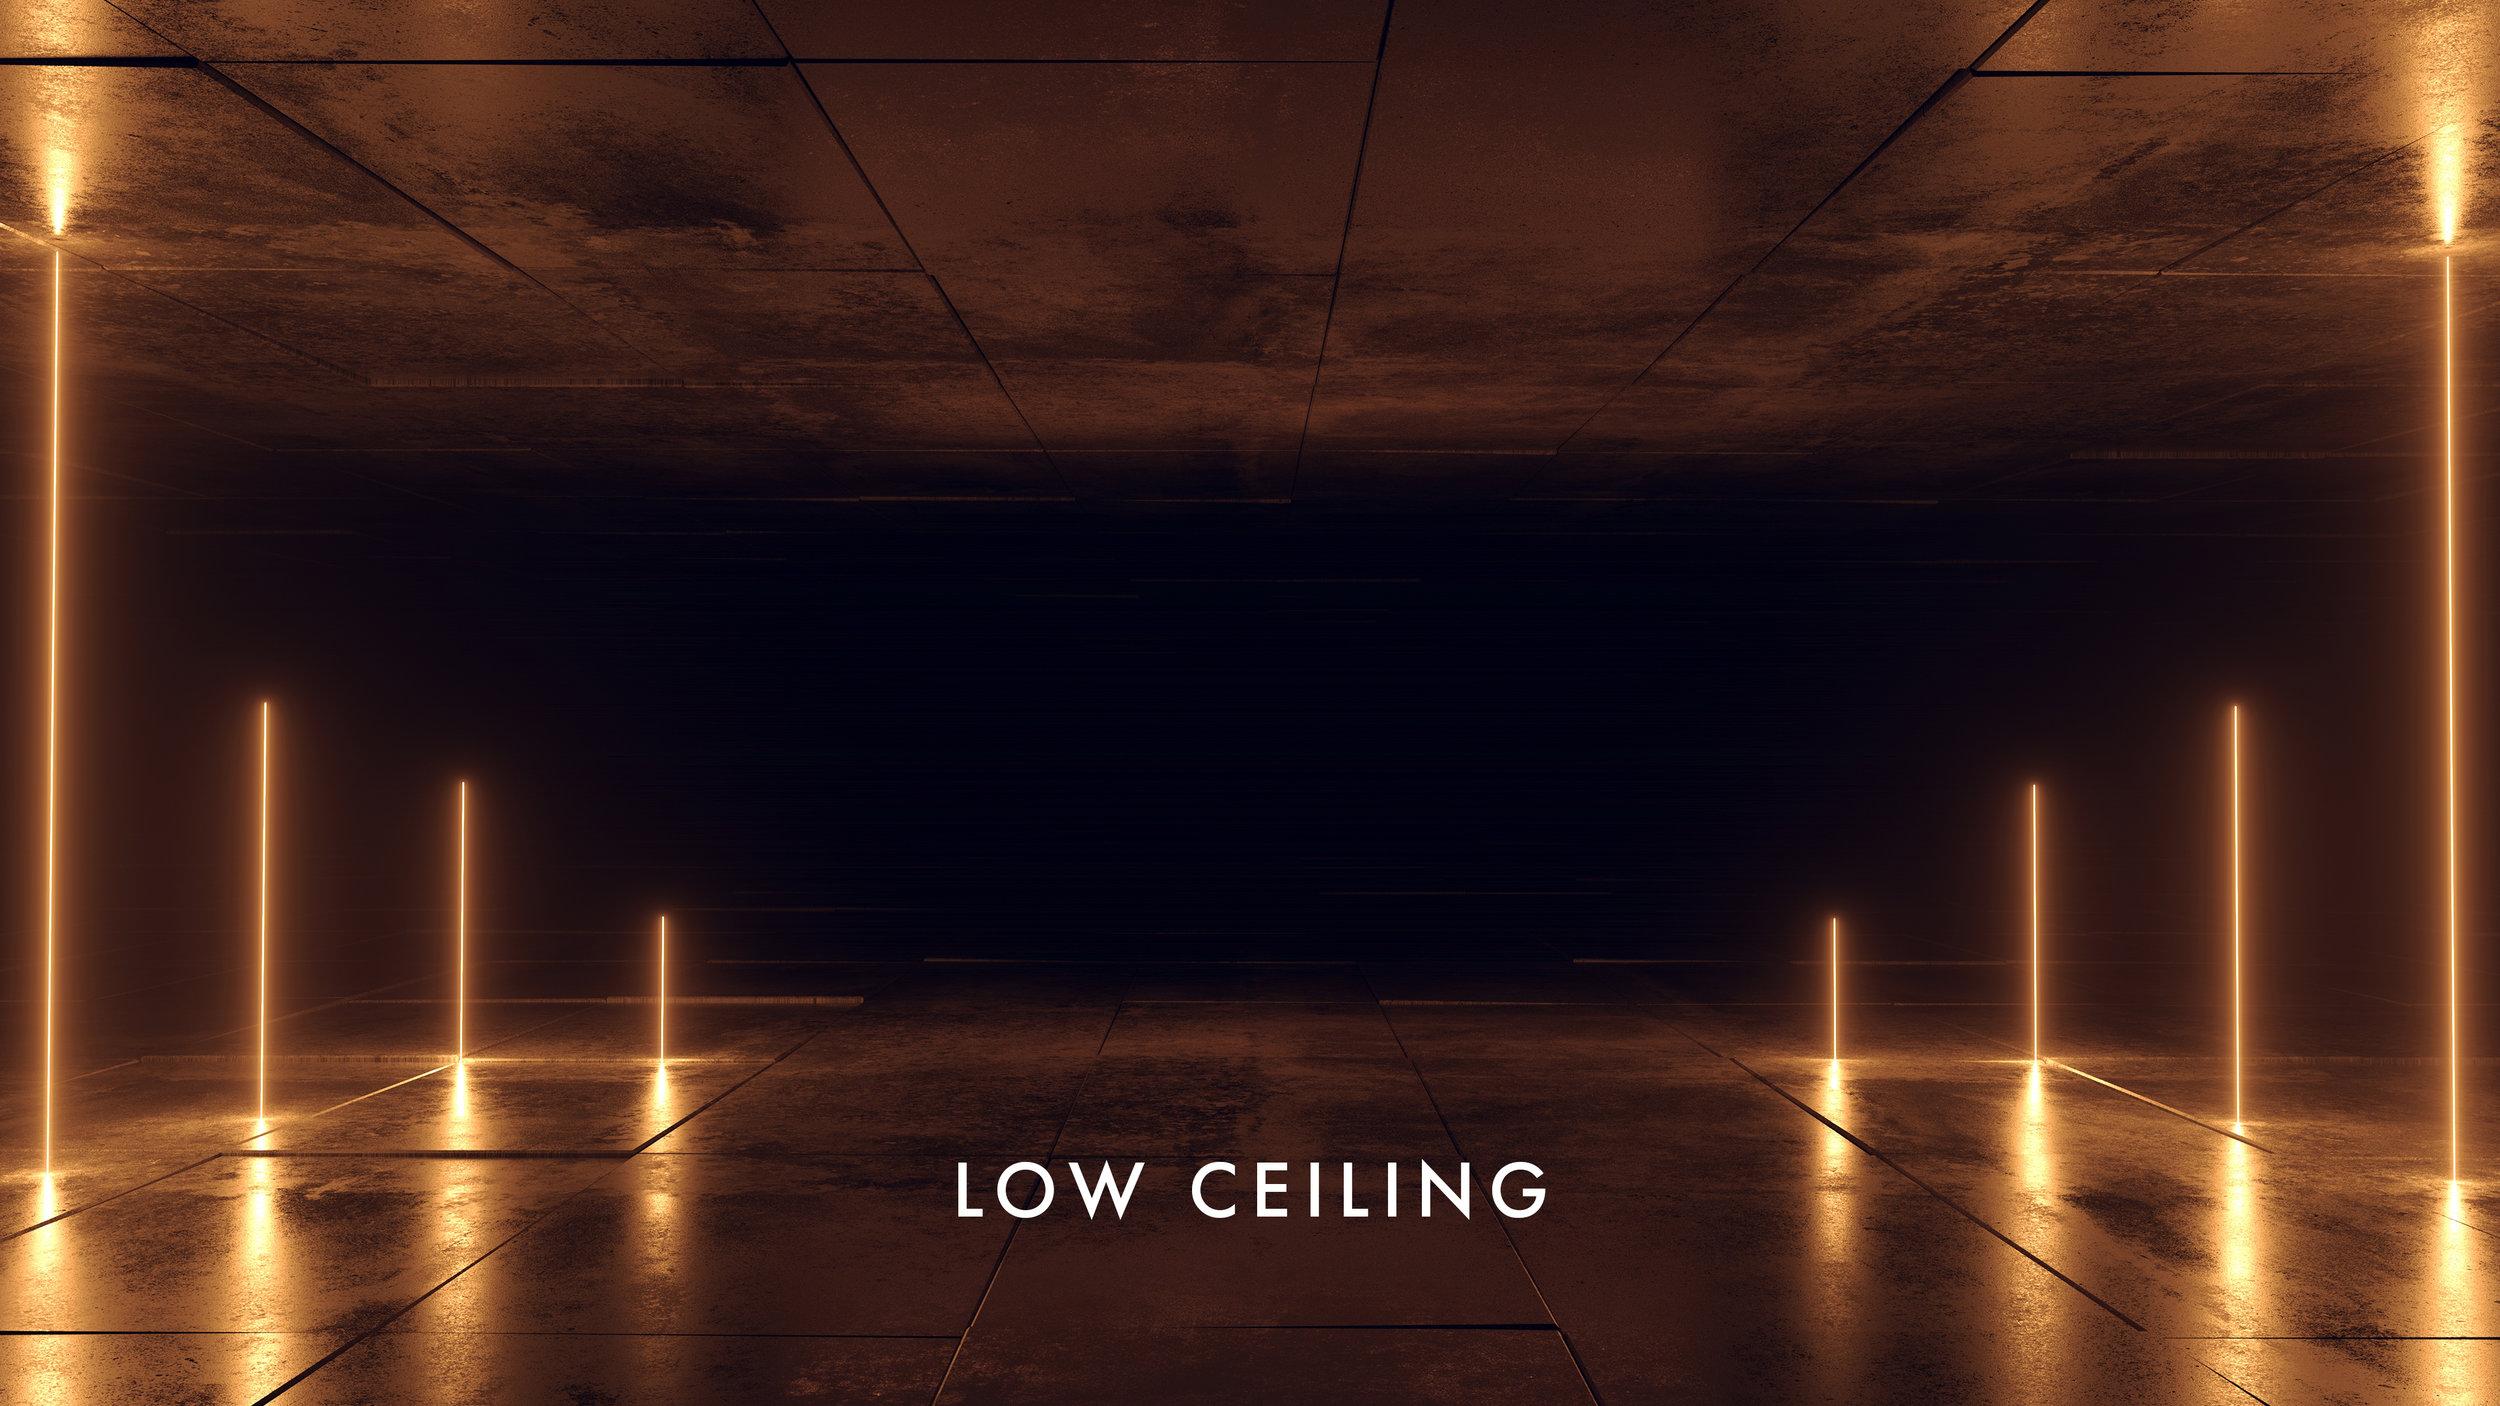 LOW CEILING WALLPAPER9.jpg